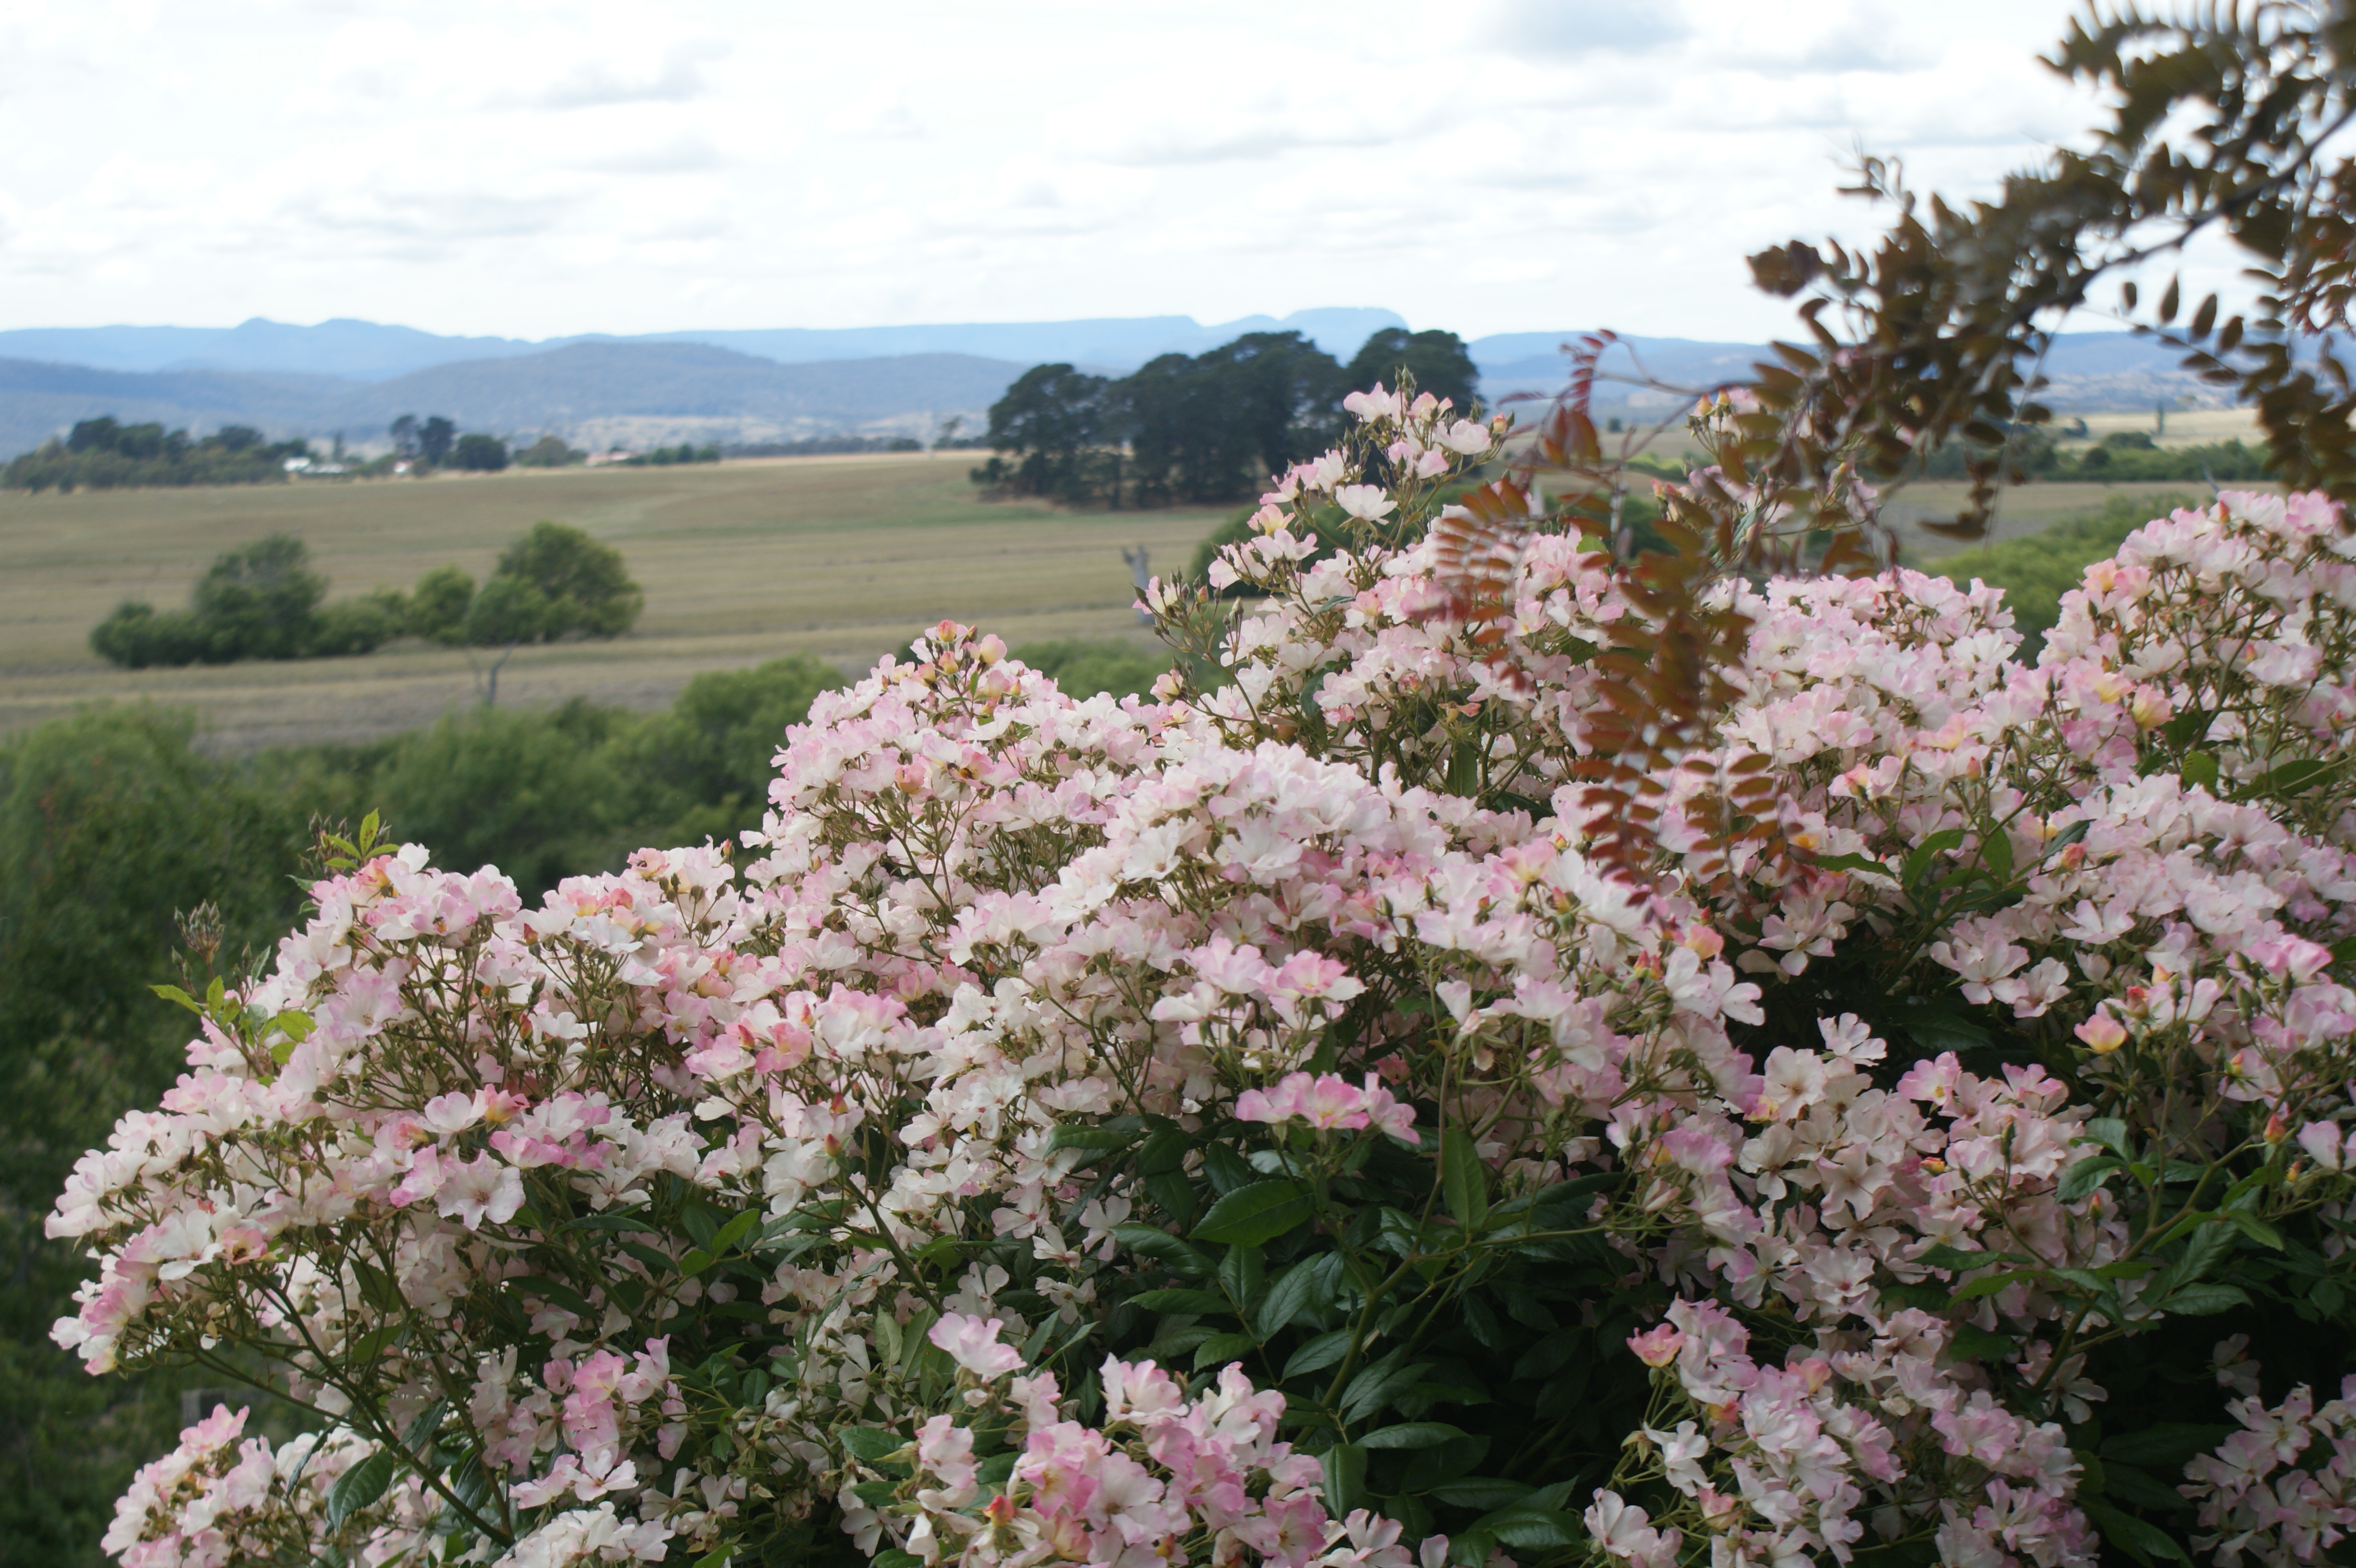 ericvale_roses_tasmanian_rose_gardens_2